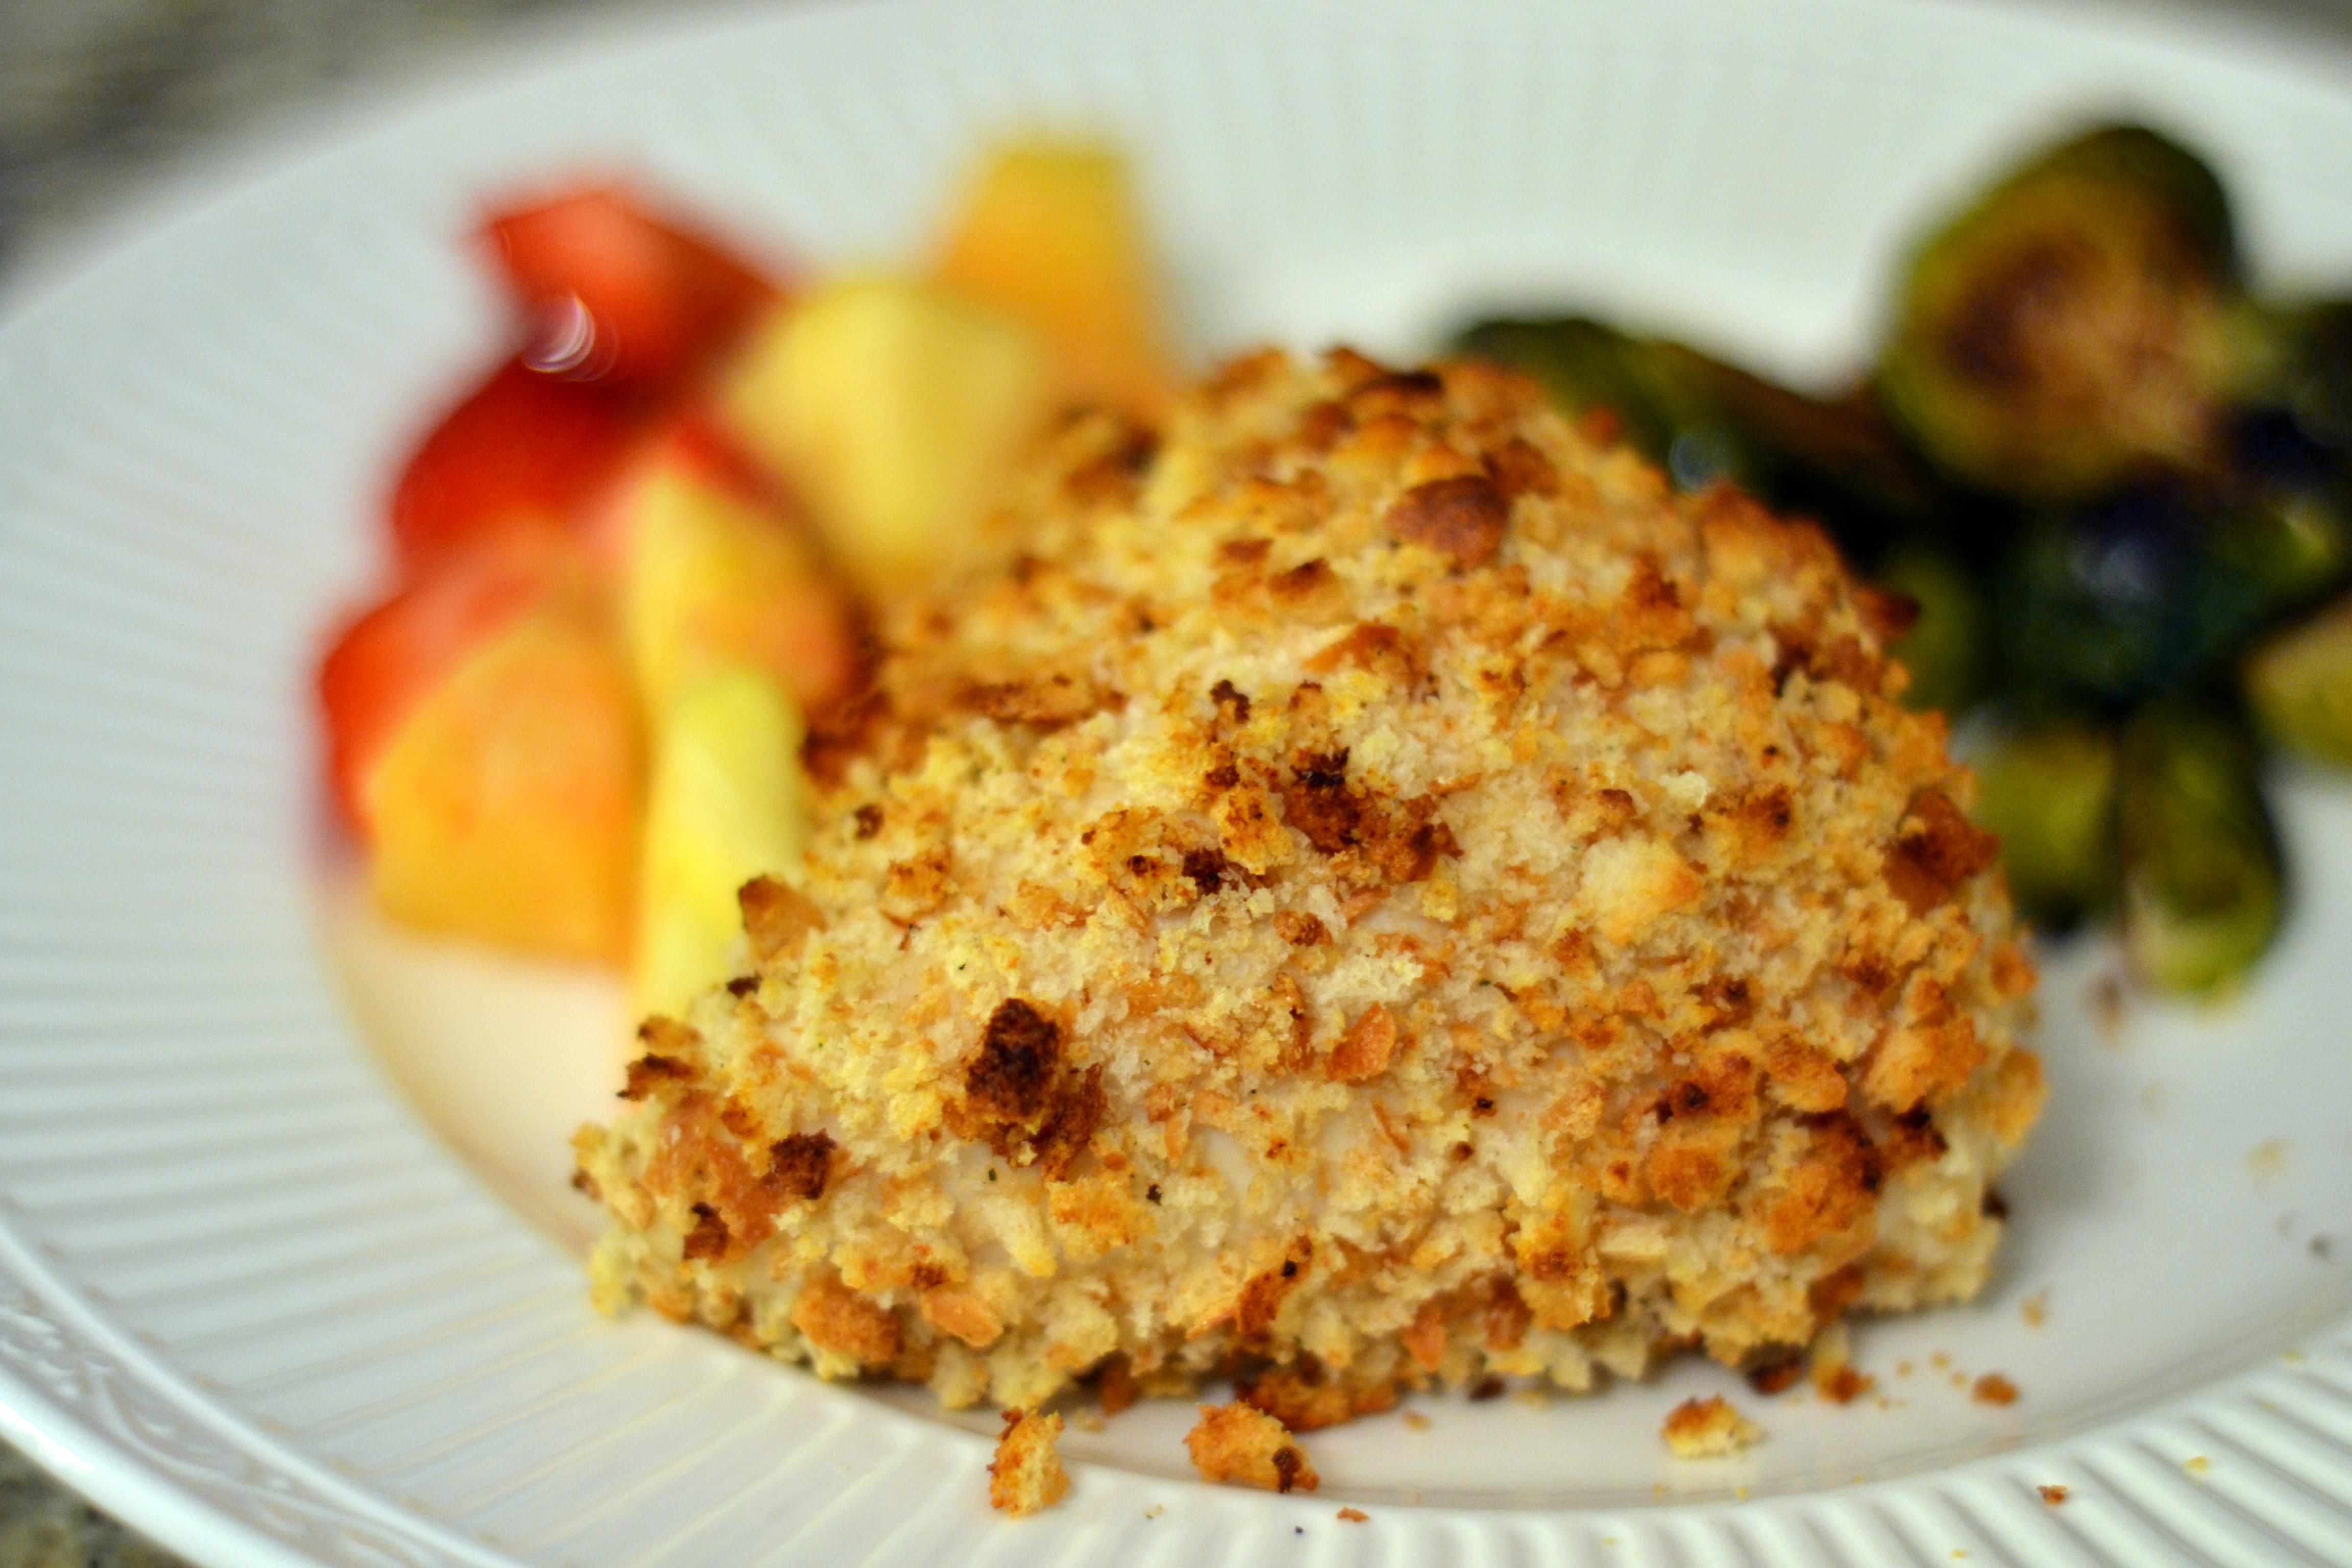 Crunchy Buttermilk Baked Chicken - Chew Nibble NoshChew Nibble Nosh